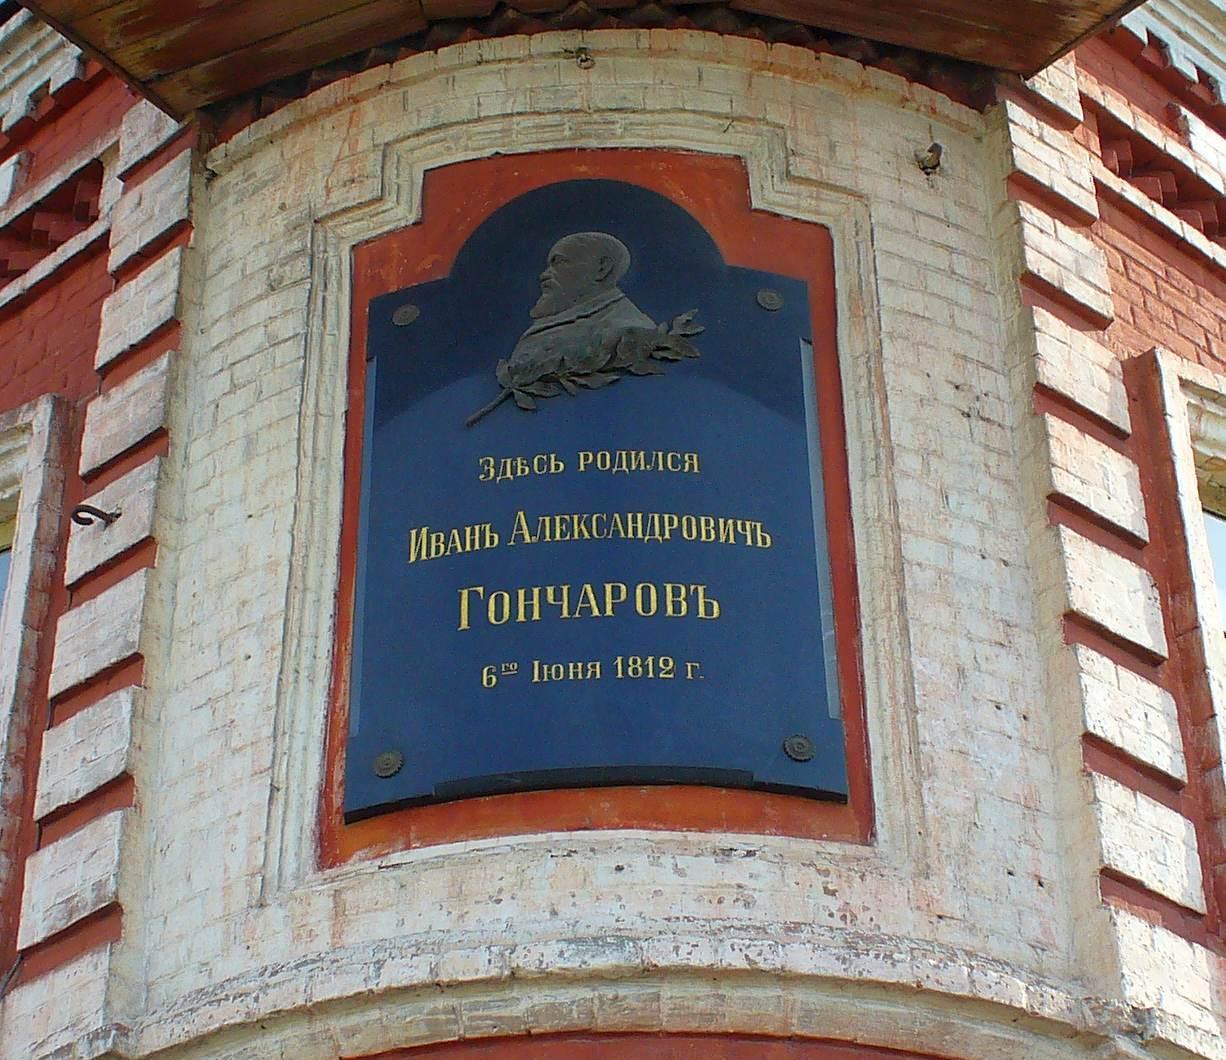 Photo of Ivan Alexandrovich Goncharov black plaque